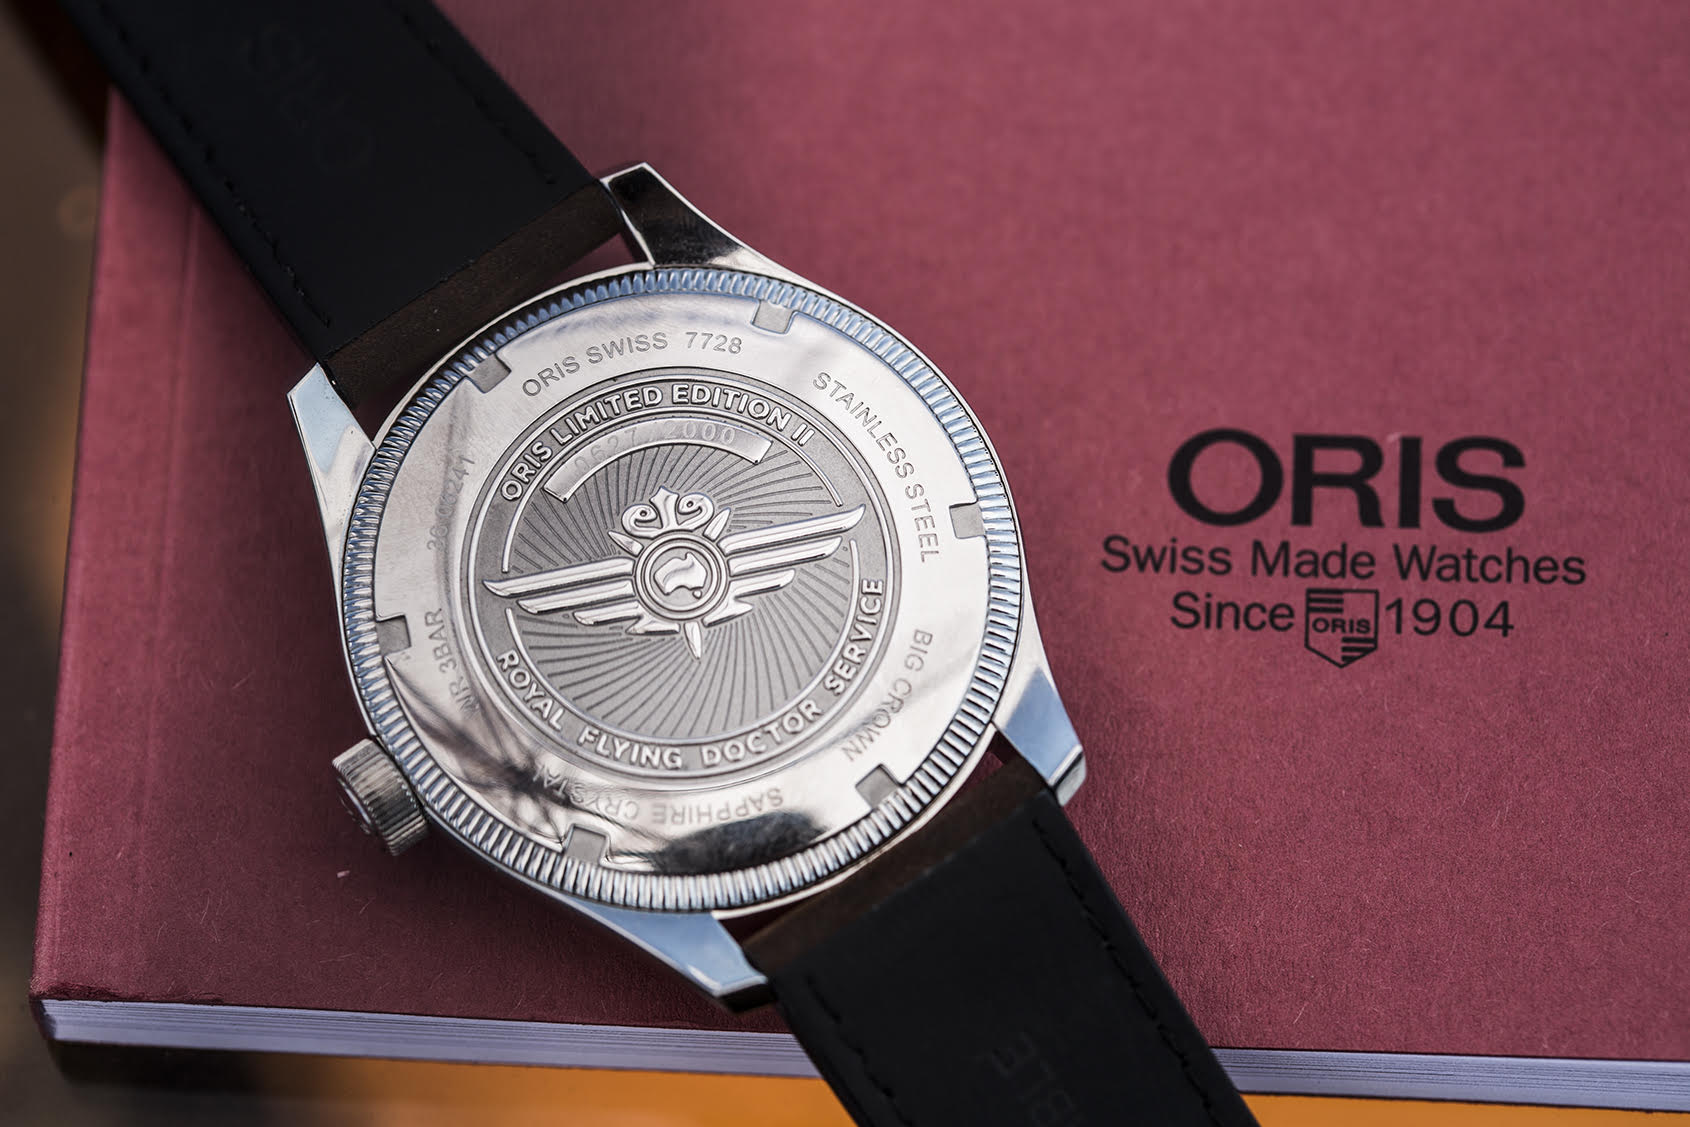 Oris-RFDSII-5